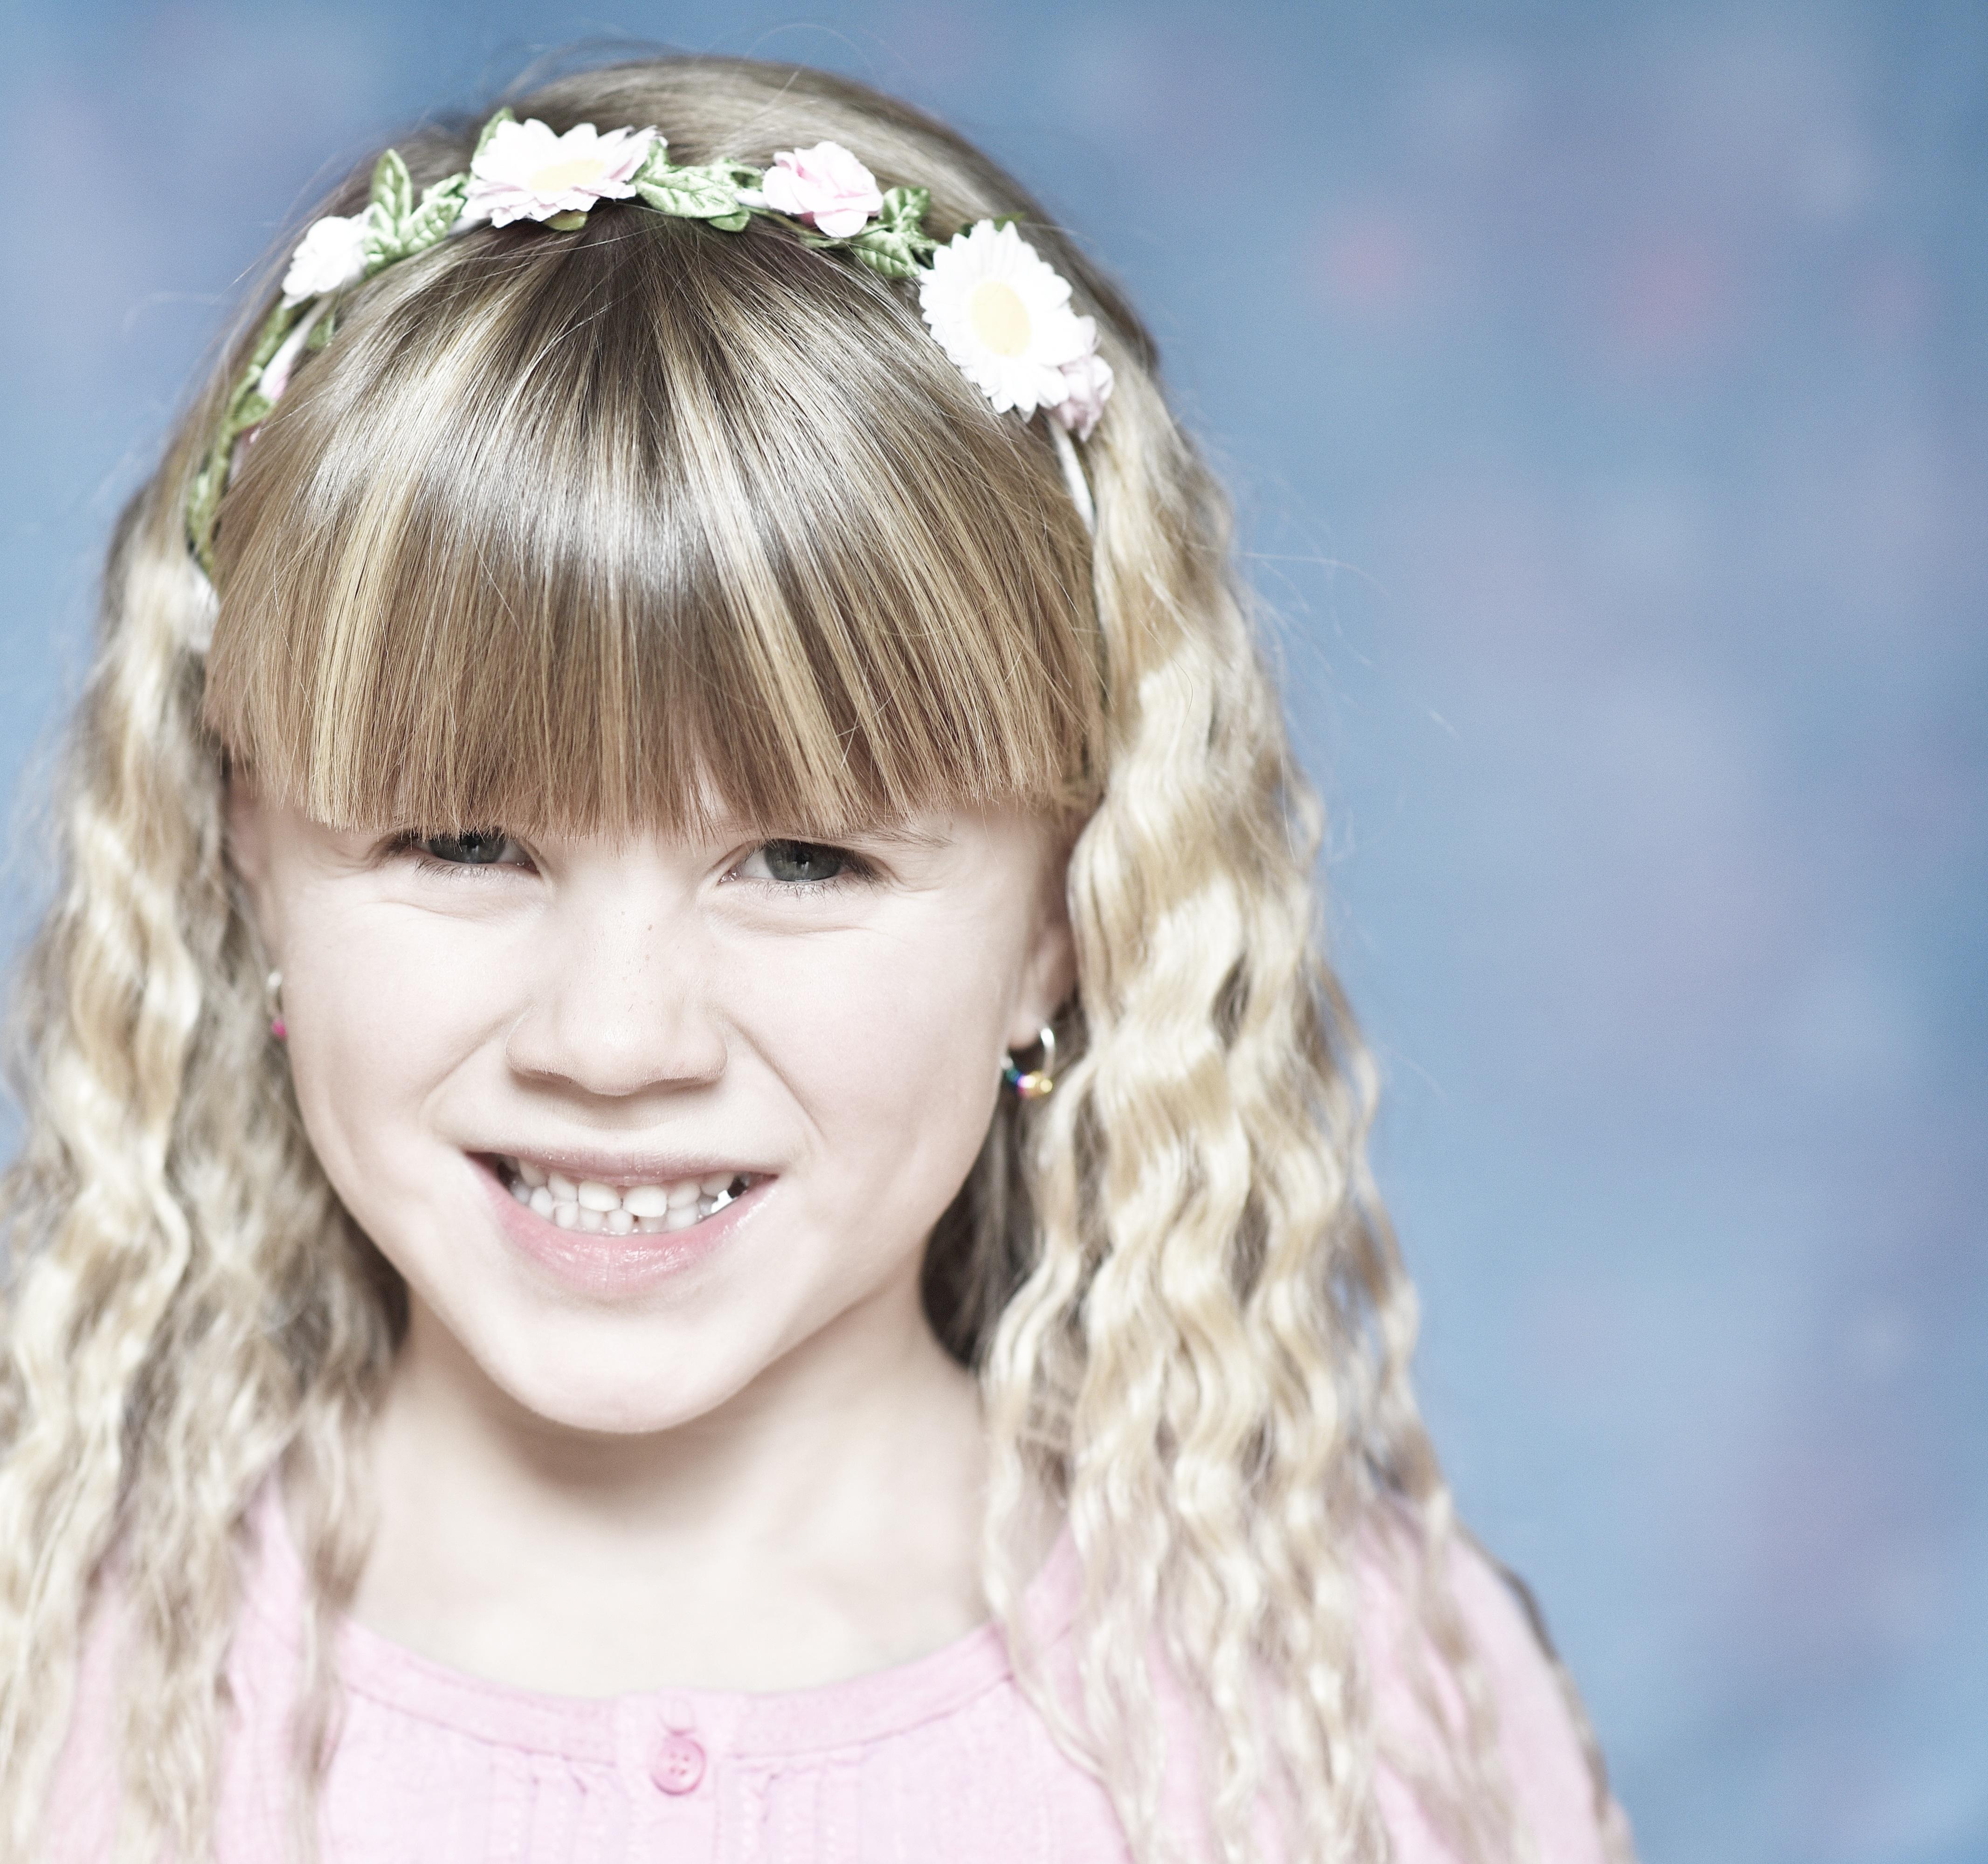 Portrait, Blonde, Child, Girl, Little, HQ Photo